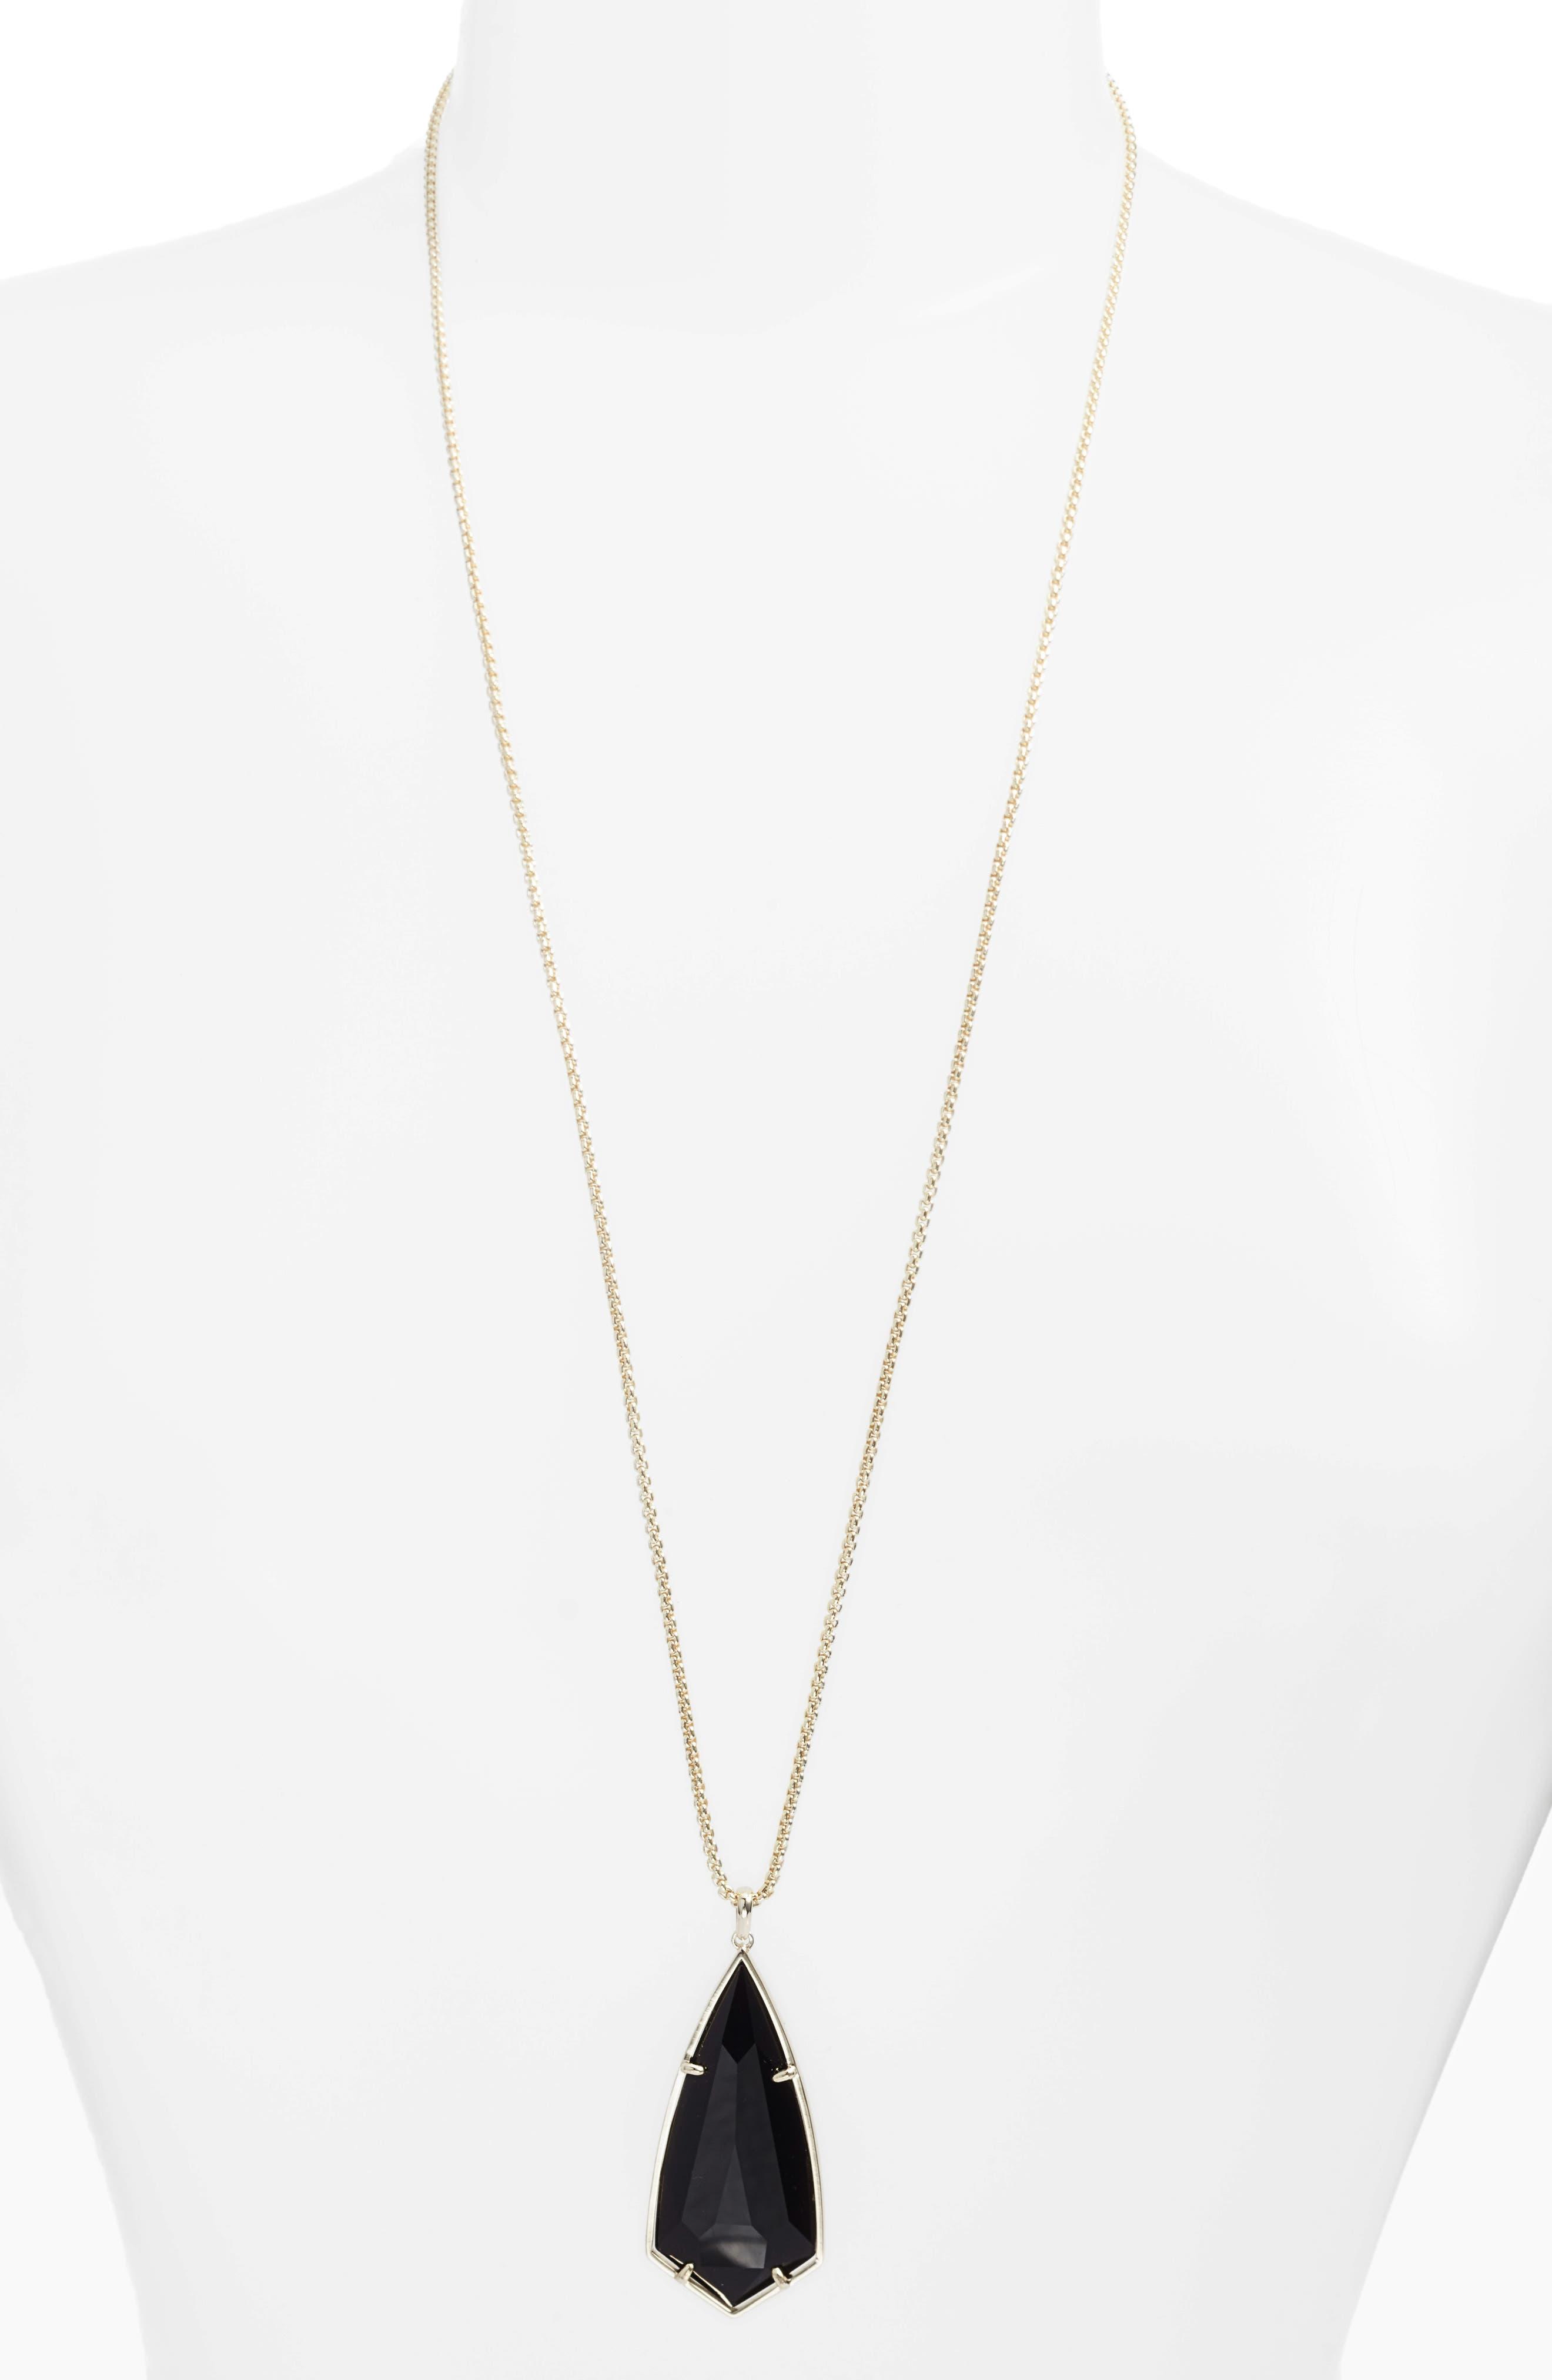 Main Image - Kendra Scott 'Carole' Long Semiprecious Stone Pendant Necklace